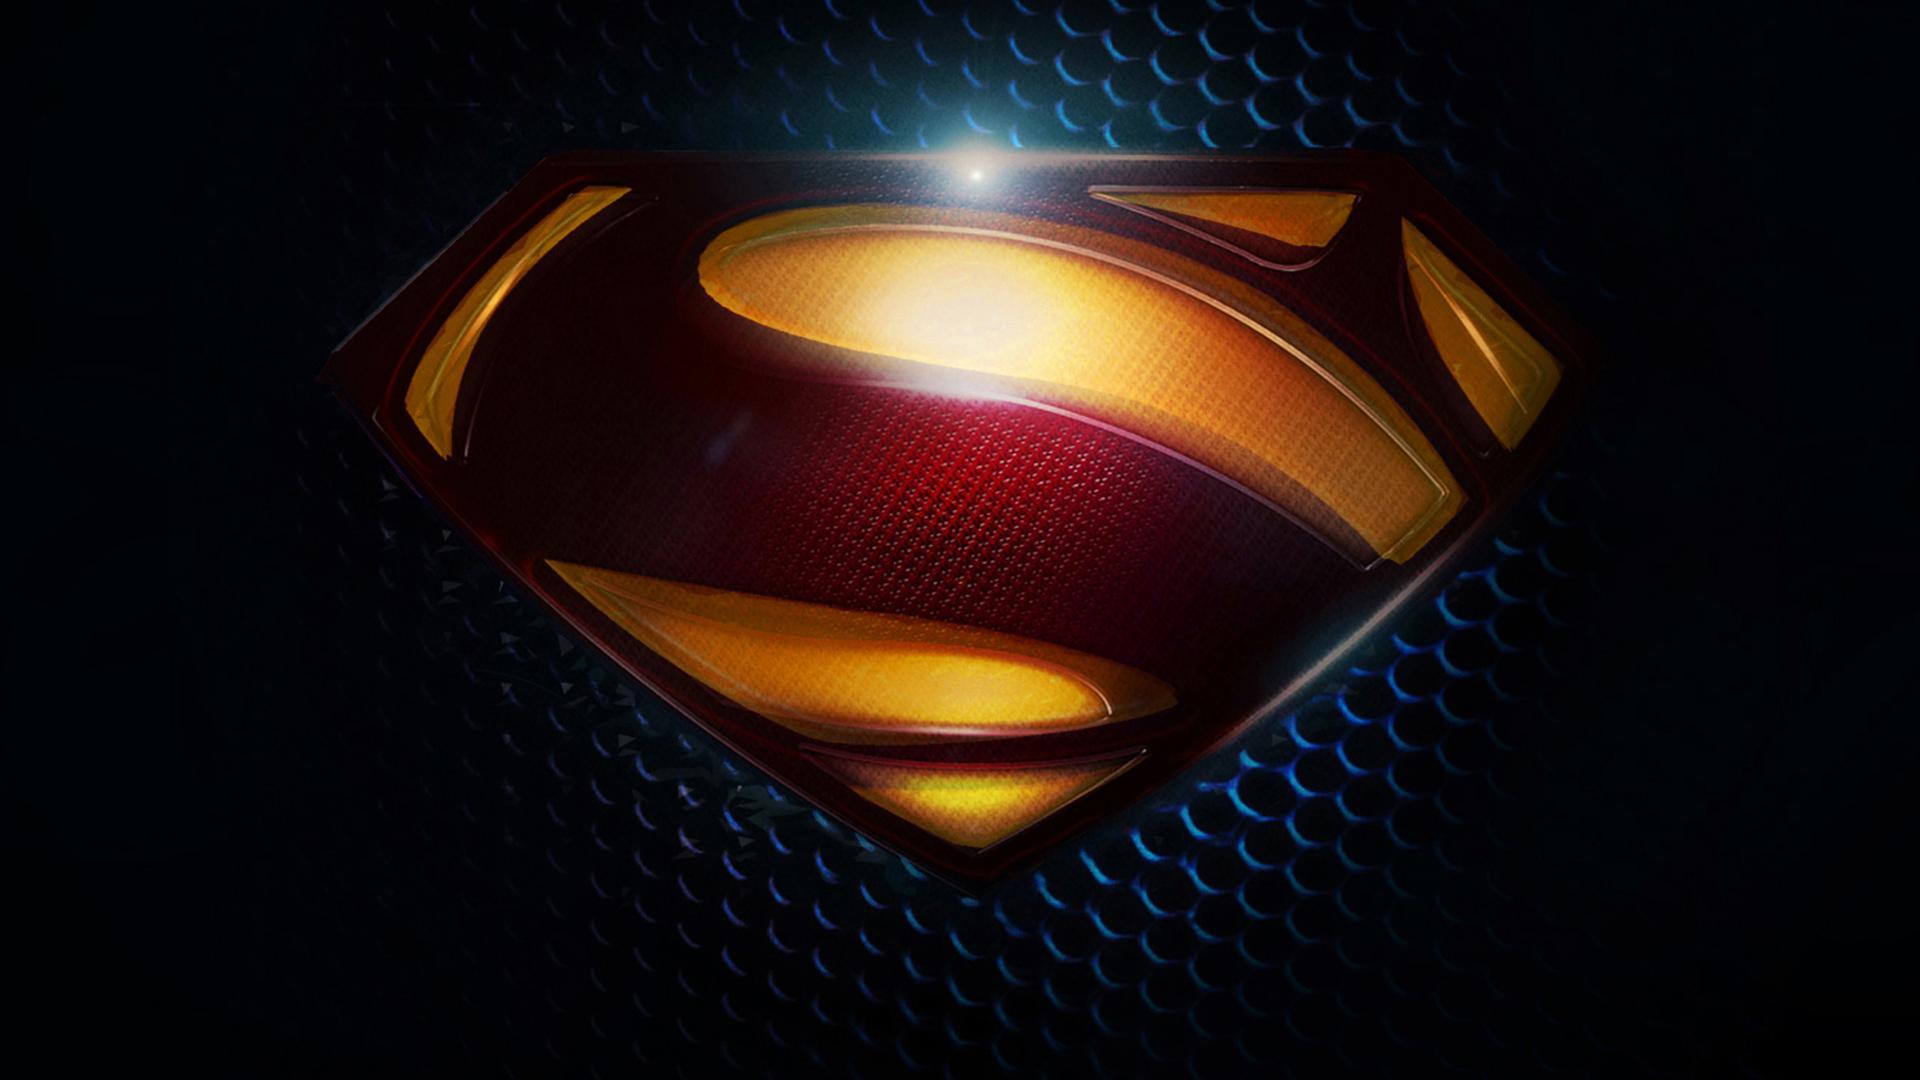 Dark Superman S Logo Wallpaper 19201080 fond ecran hd 1920x1080